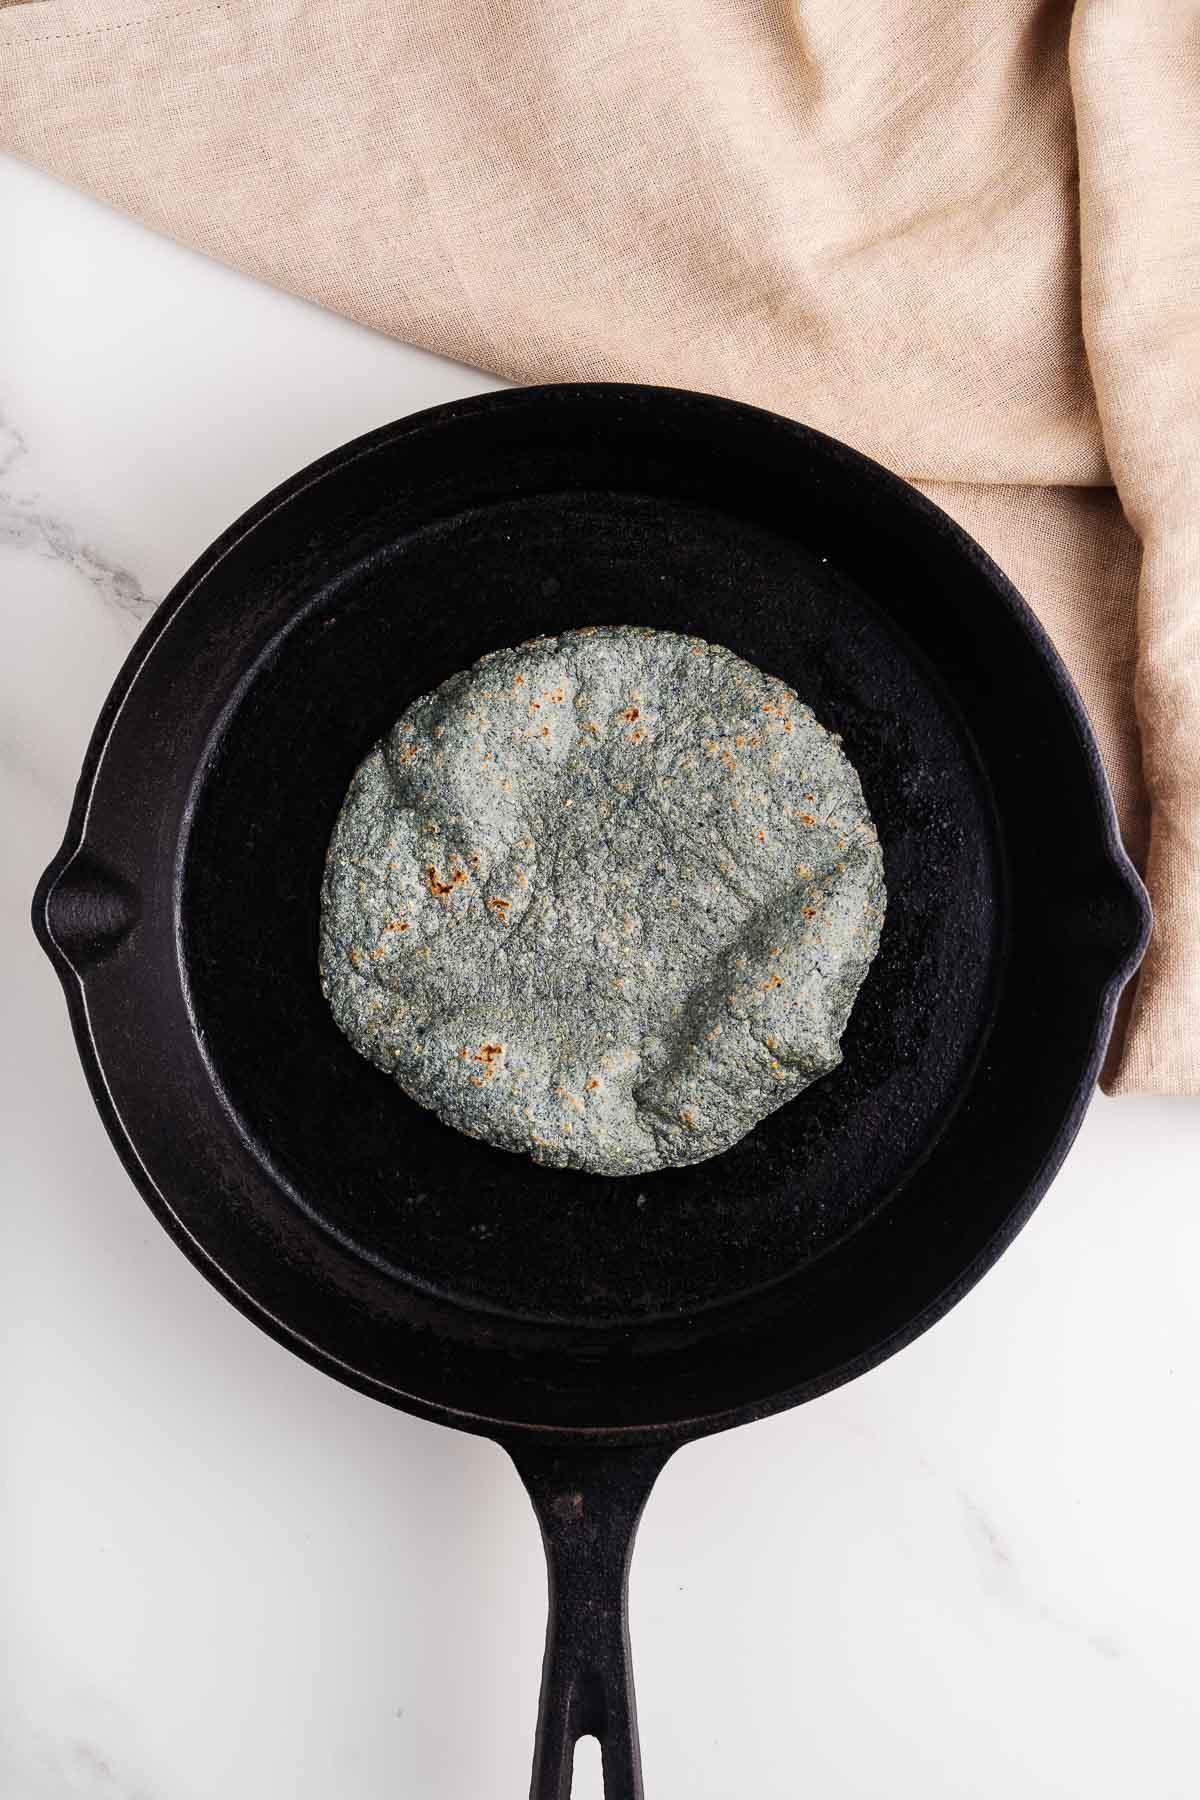 Blue Corn Tortilla in a Skillet